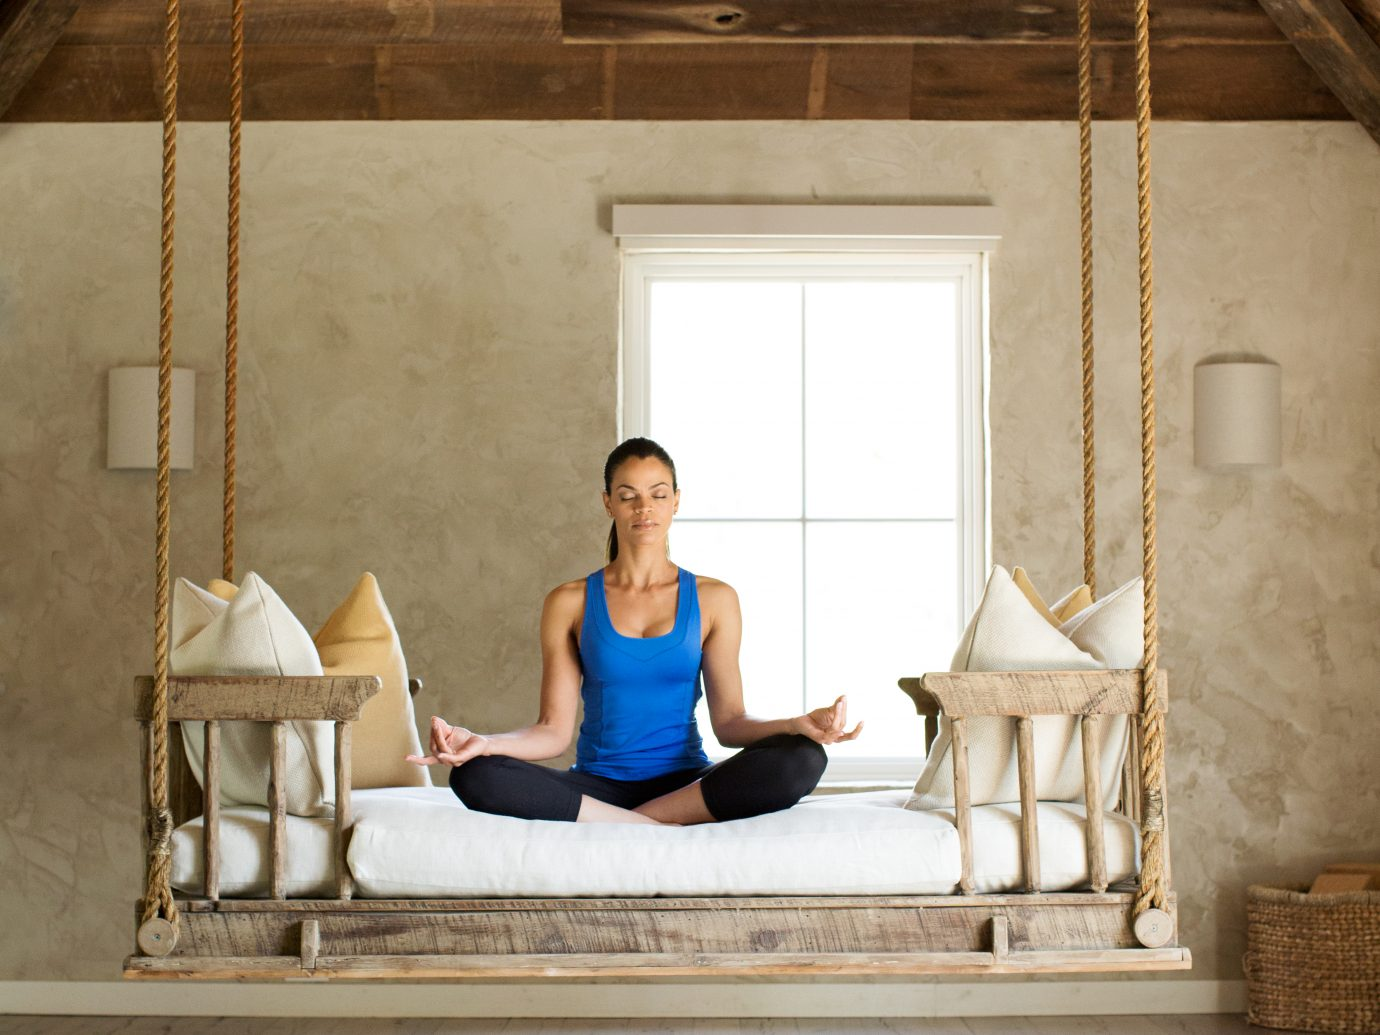 woman meditating on hanging bench